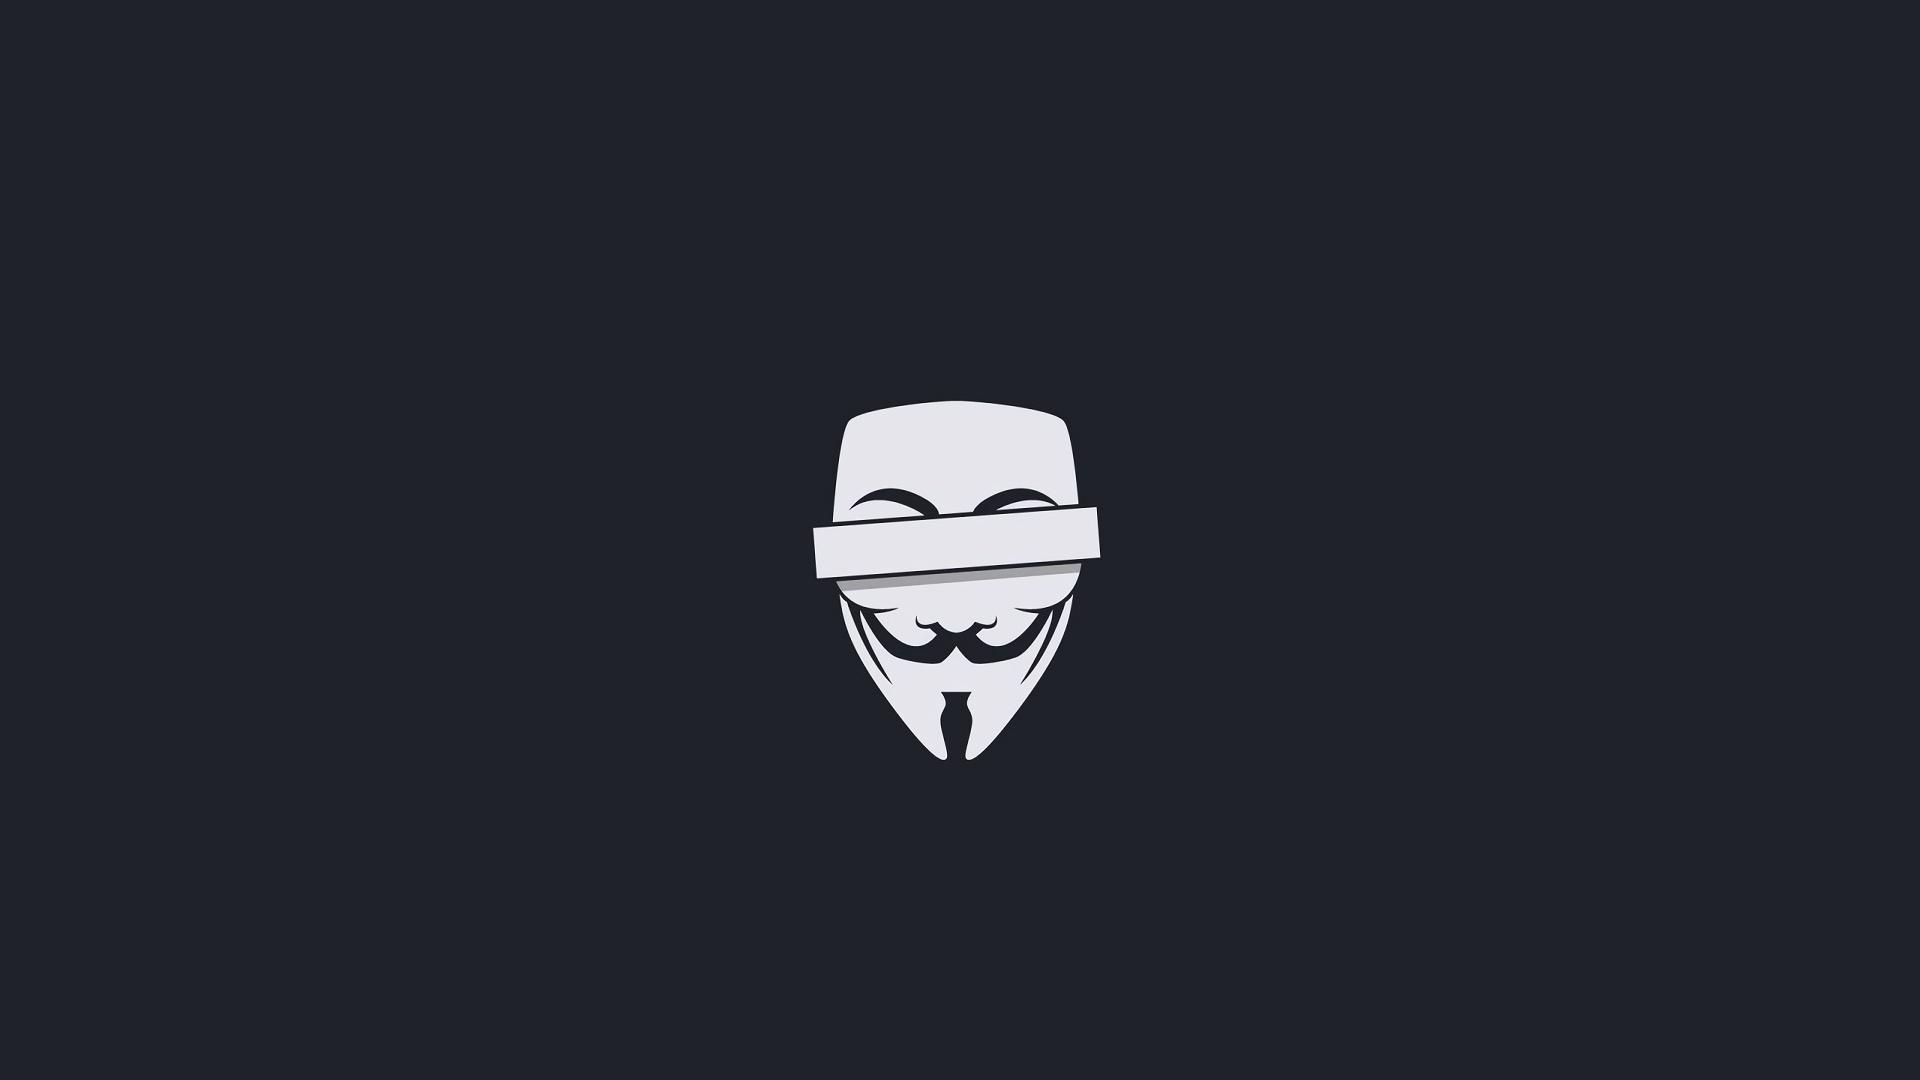 Download 1920x1080 Wallpaper Movie Minimal Mask V For Vendetta